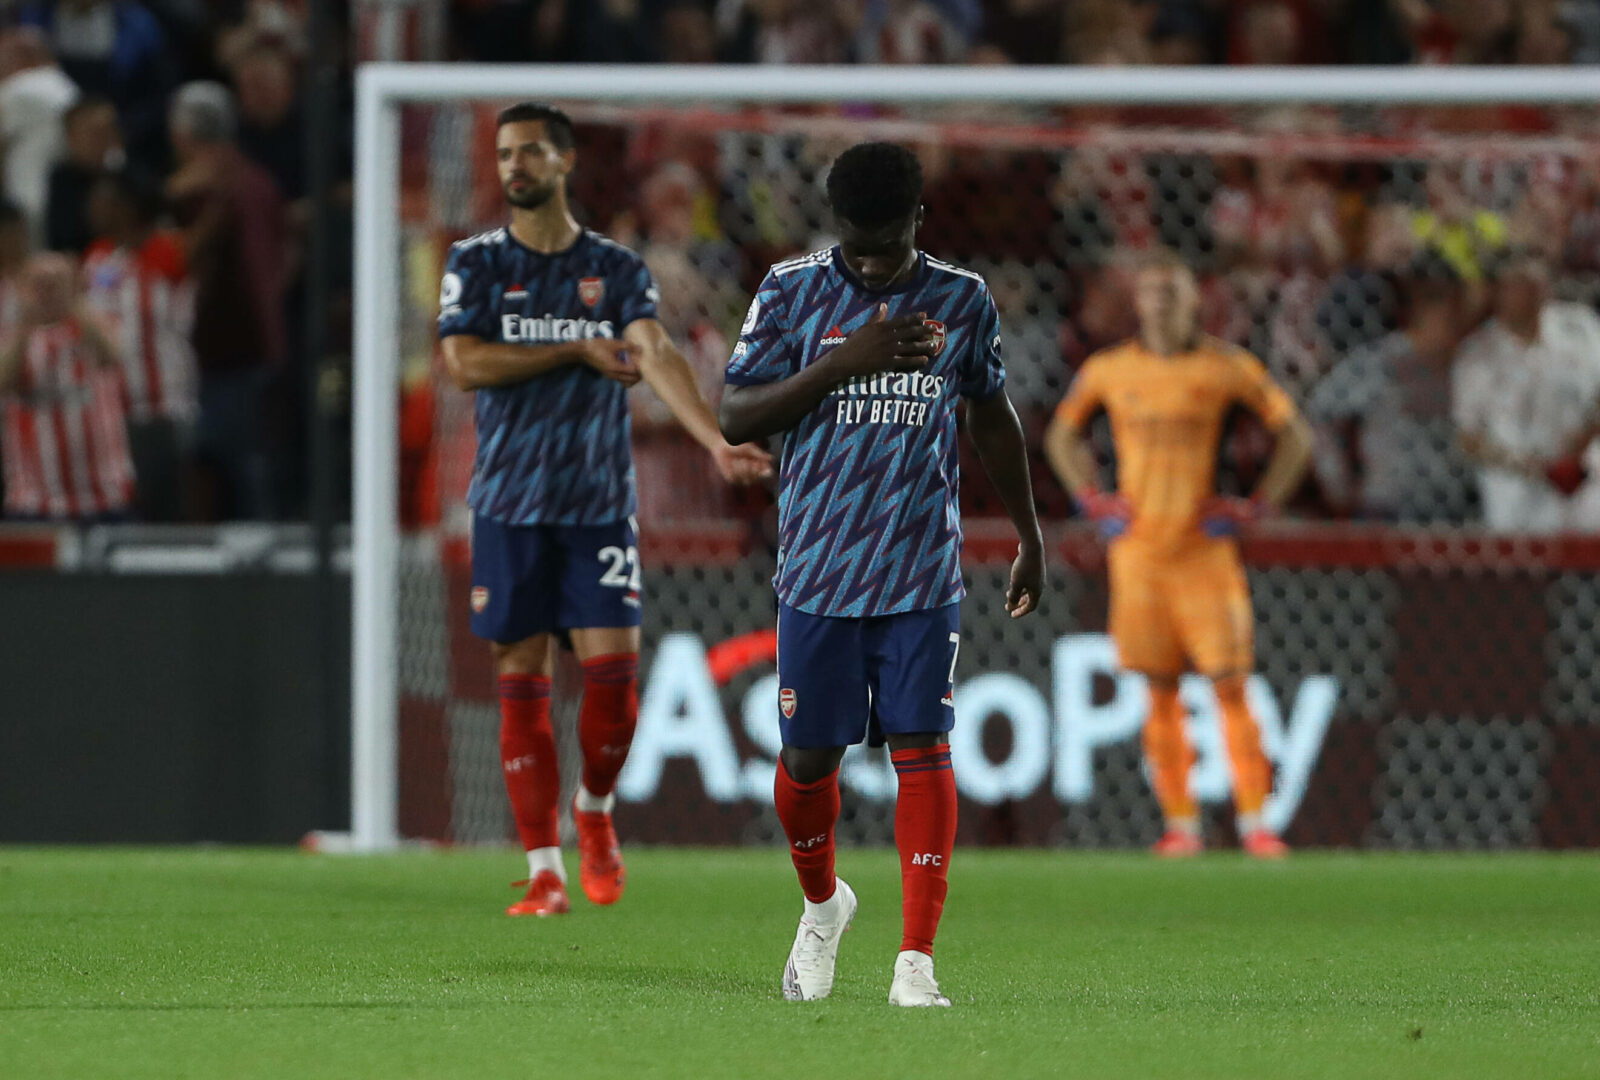 Arsenal: Saka reagiert enttäuscht auf ein Gegentor.